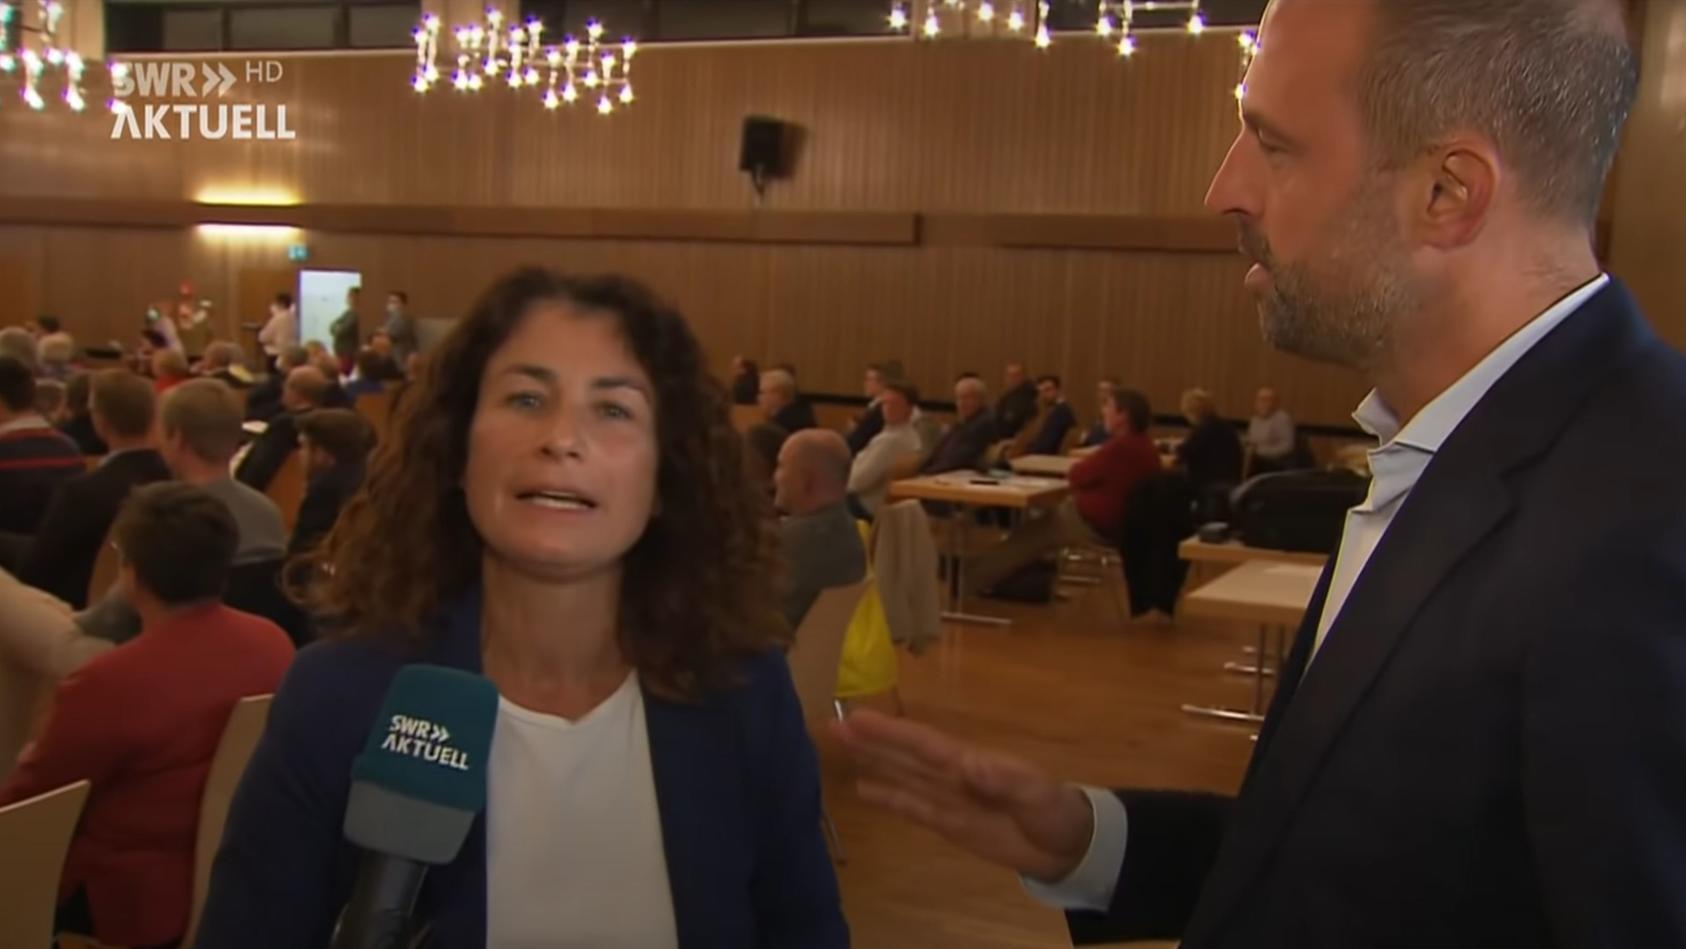 skandal-im-live-tv-cdu-mann-wurgt-reporterin-ab